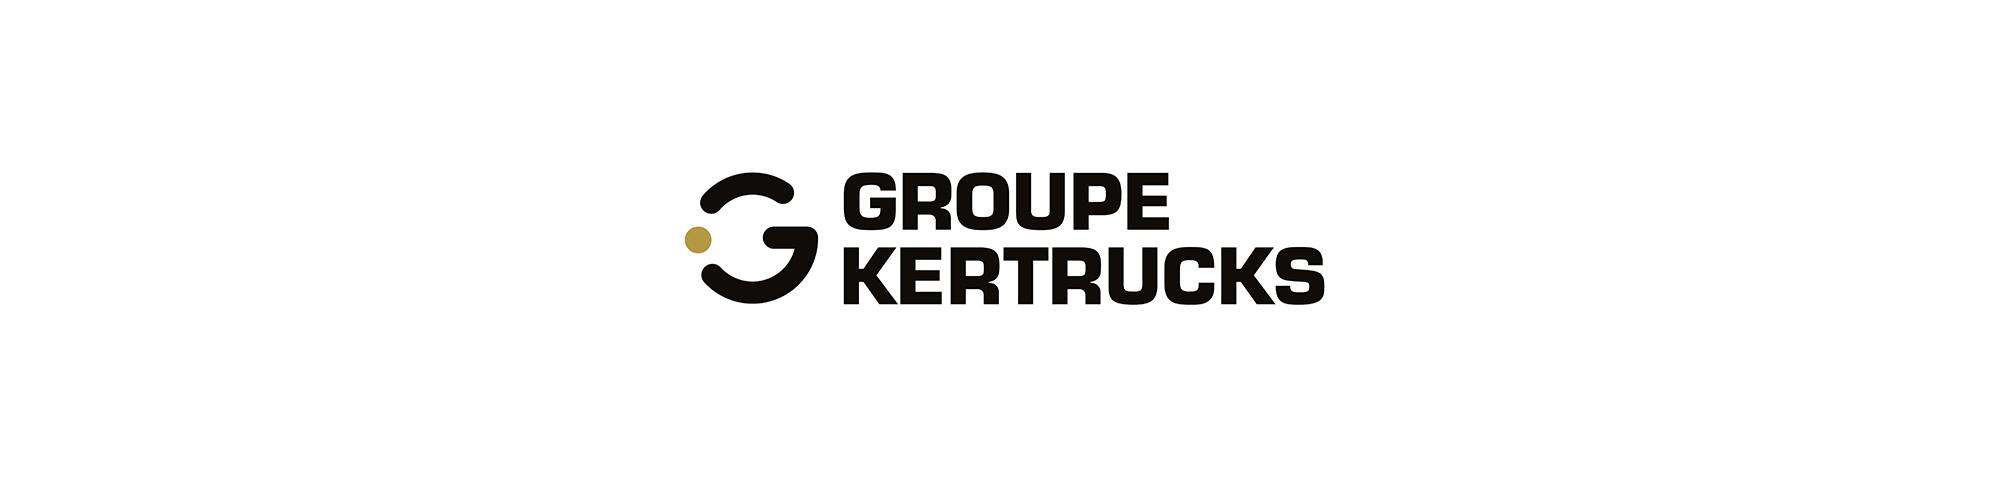 Logo GROUPE KERTRUCKS FINANCE Rennes